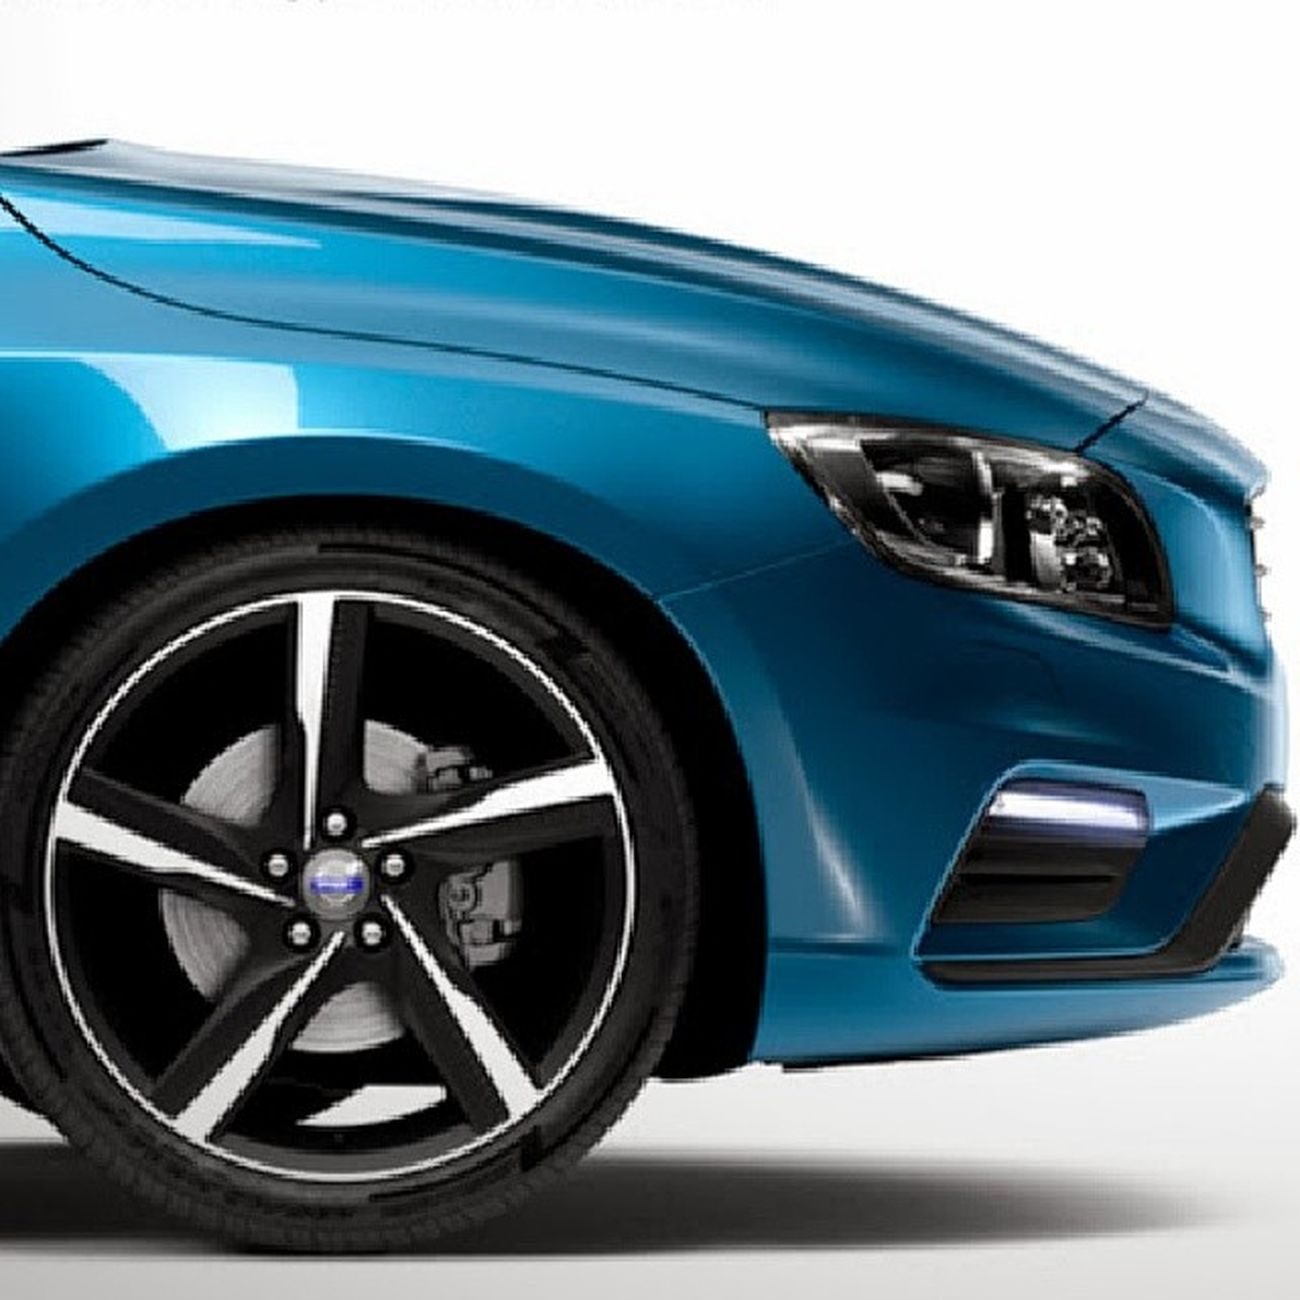 S60 Powerblue Modelyear 2014 Volvo VolvoCars